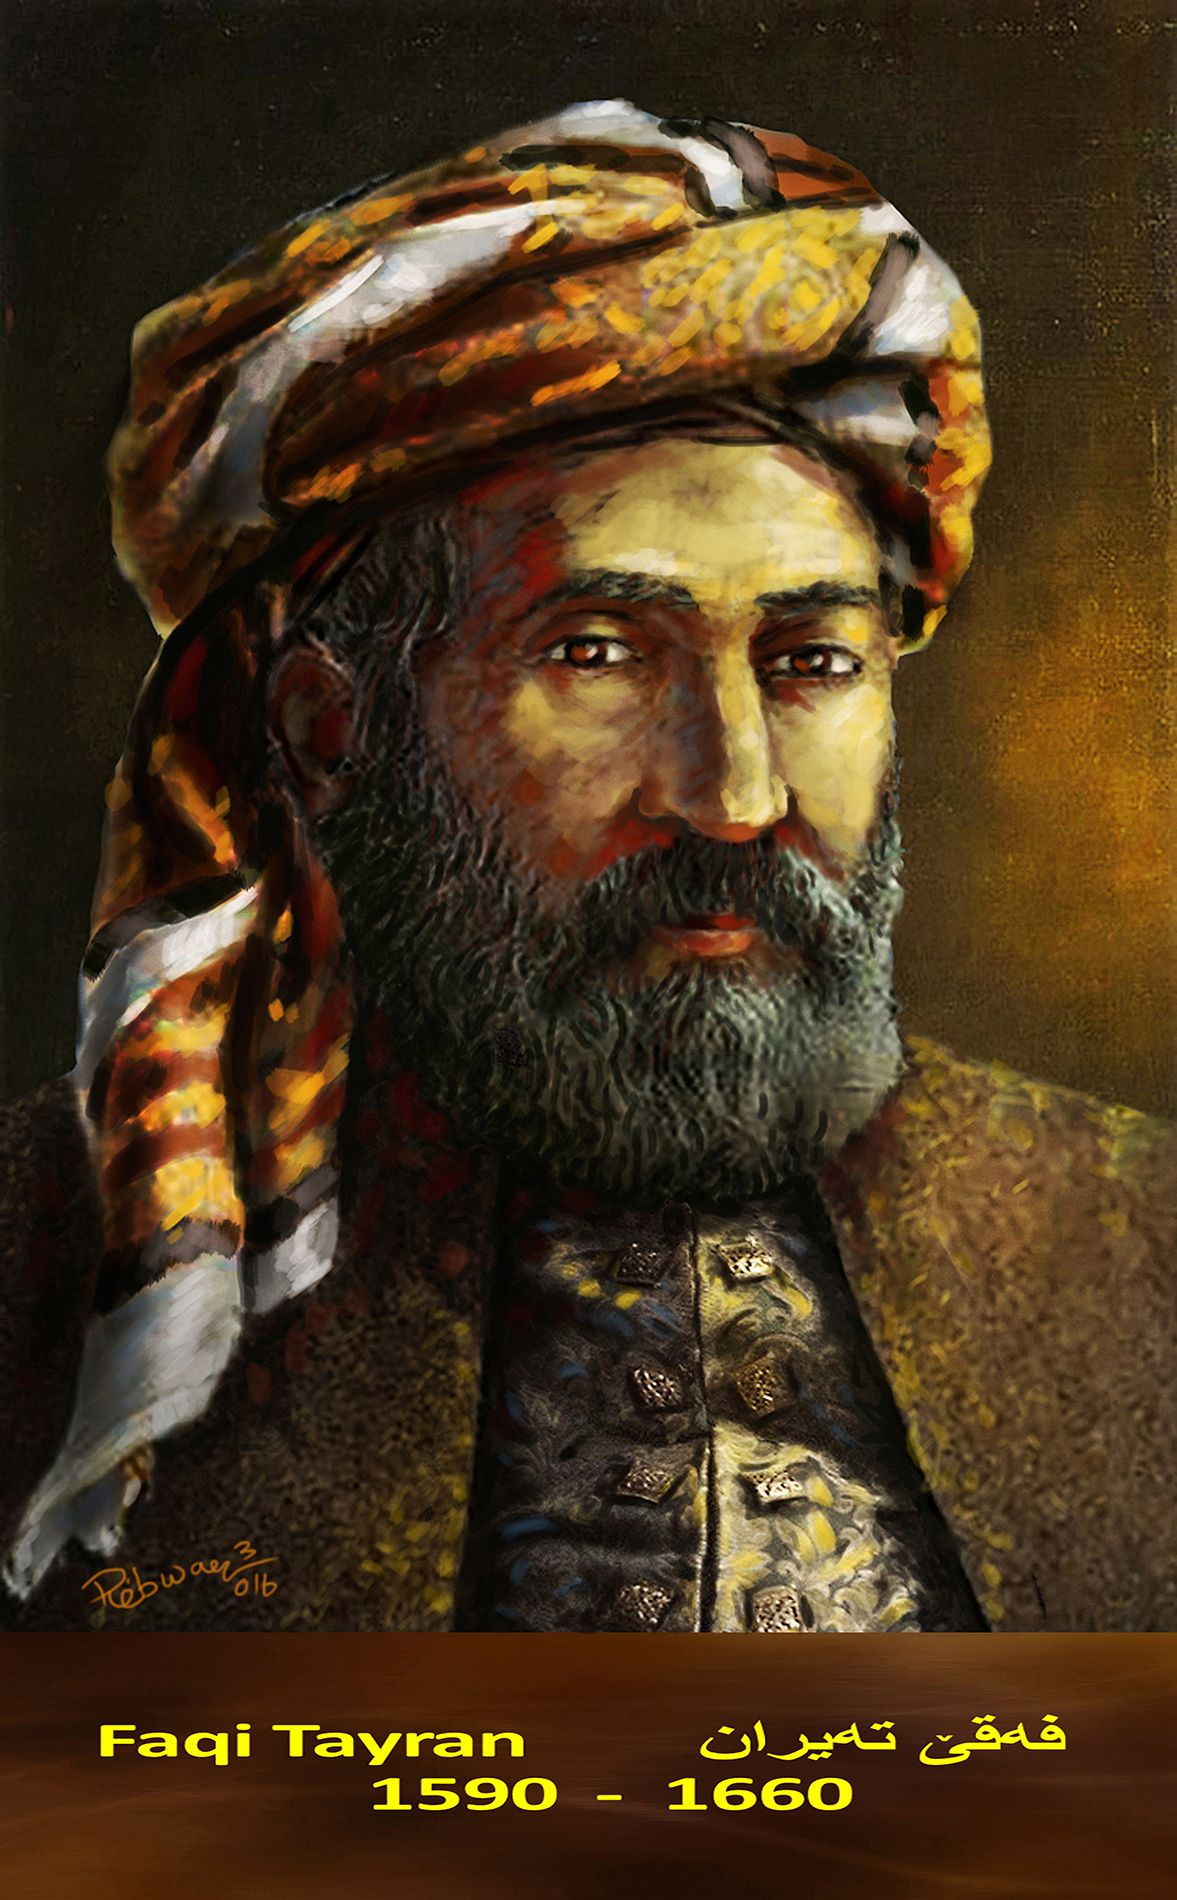 Faqi Tayran, (1590–1660) is considered one of the great classic Kurdish poets and writers. by Rebwar K Tahir.